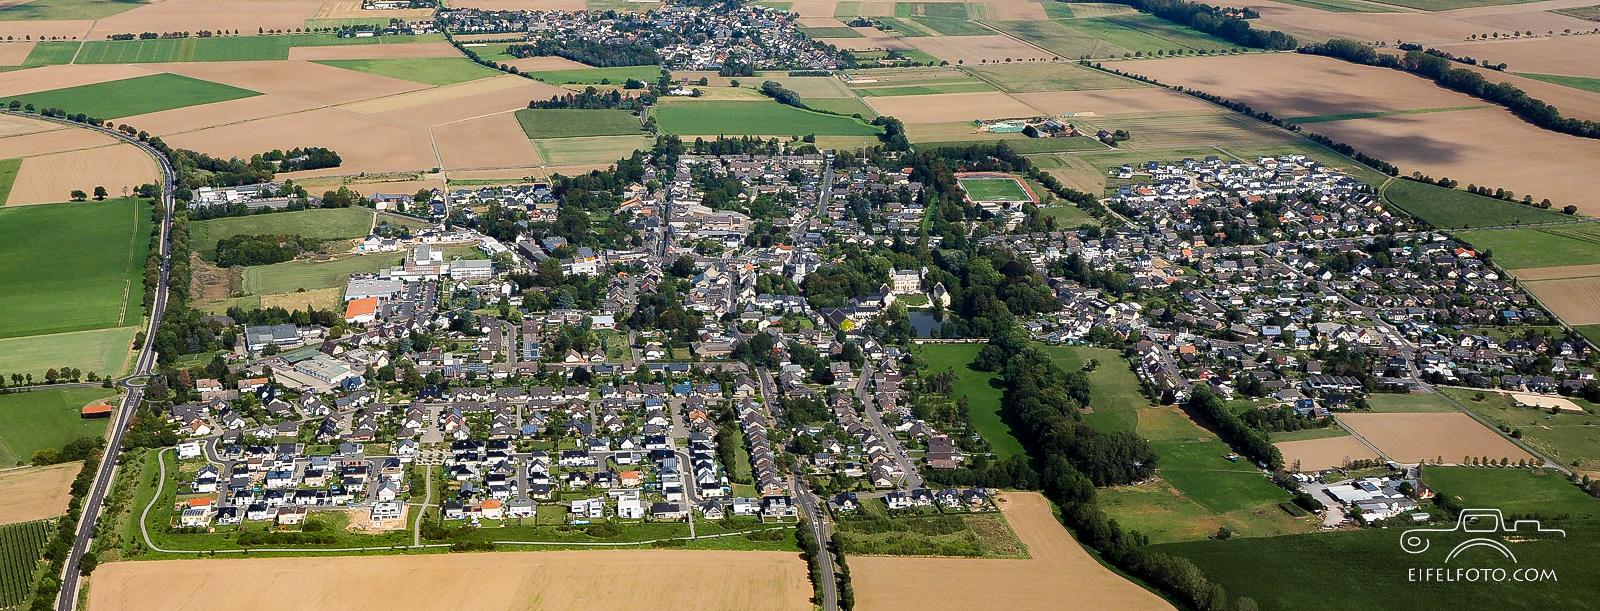 EU-Flamersheim